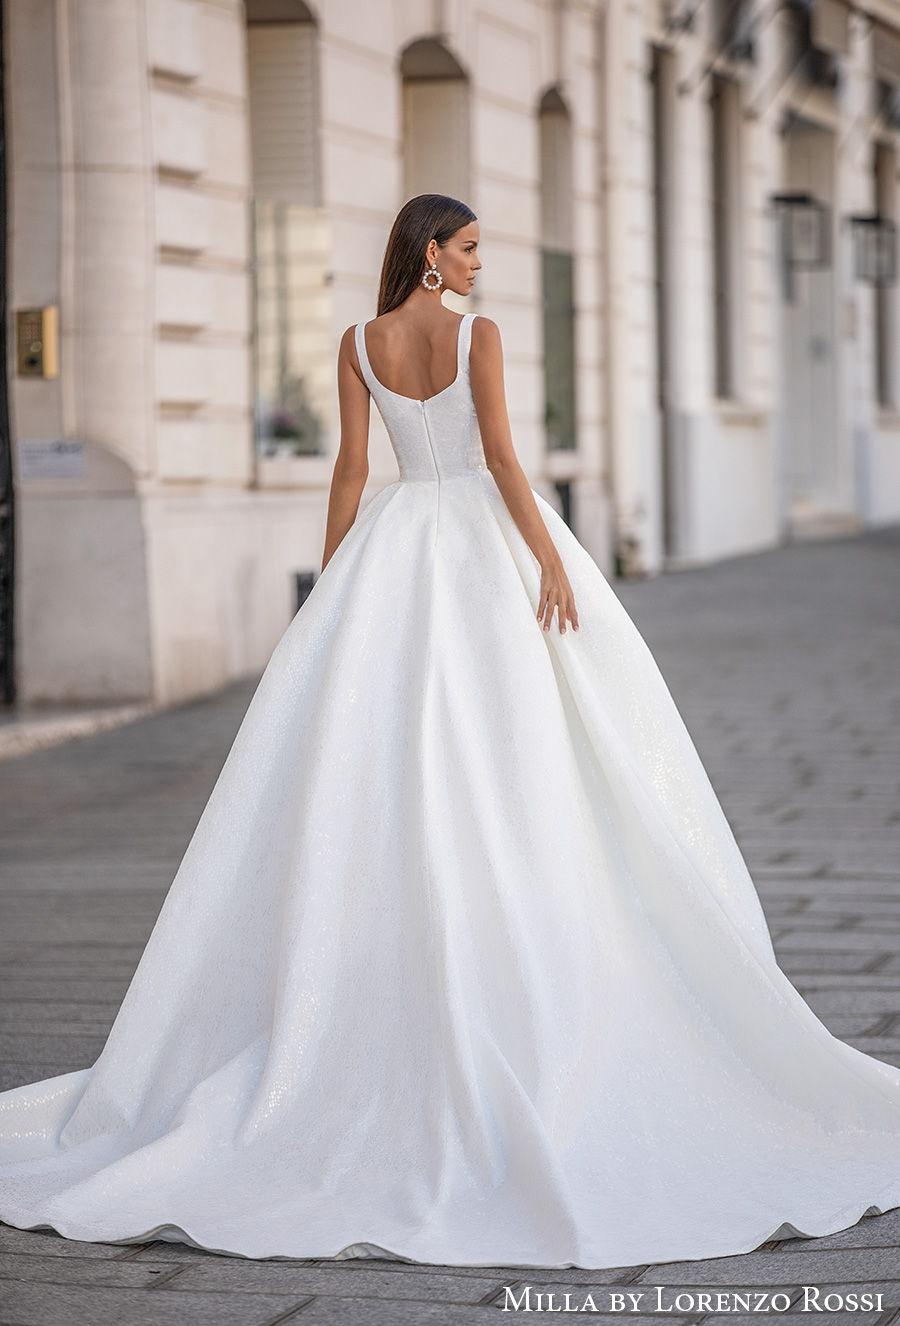 milla lorenzo rossi 2021 bridal sleeveless with strap square neckline simple minimalist elegant ball gown a  line wedding dress mid back chapel train (gabrielle) bv